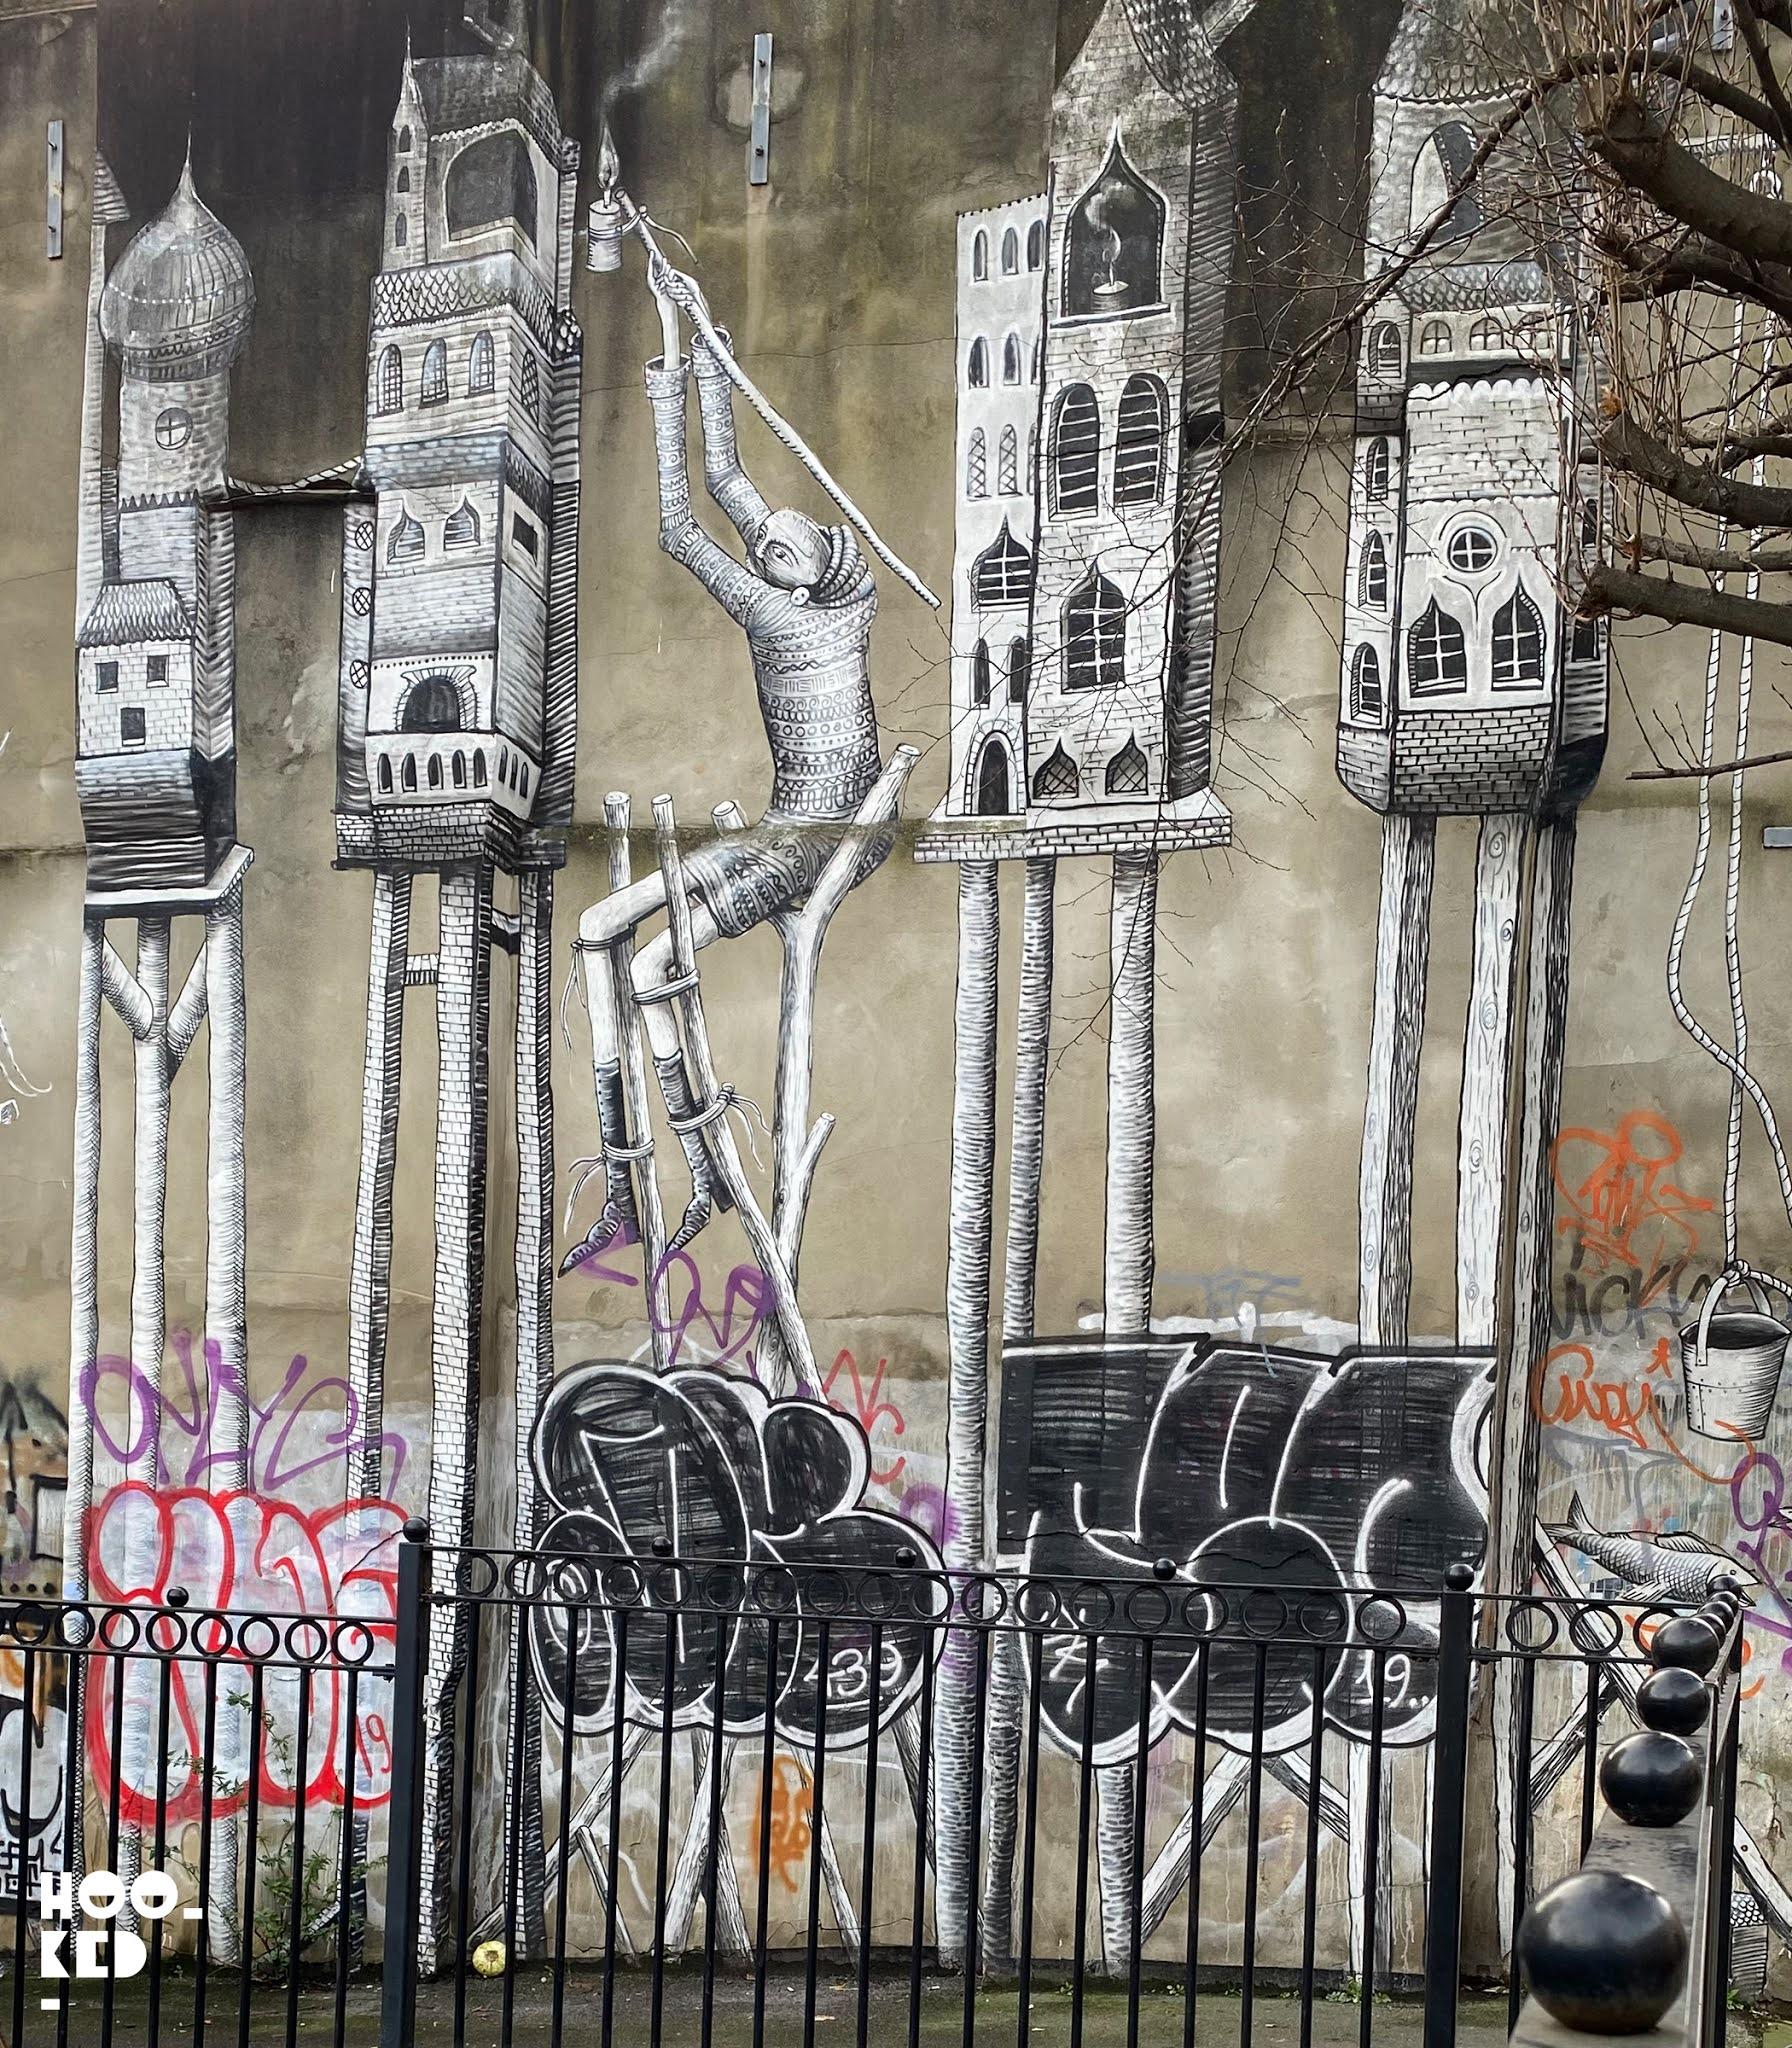 London Street Art- Phlegm's London Mural on Heneage Street